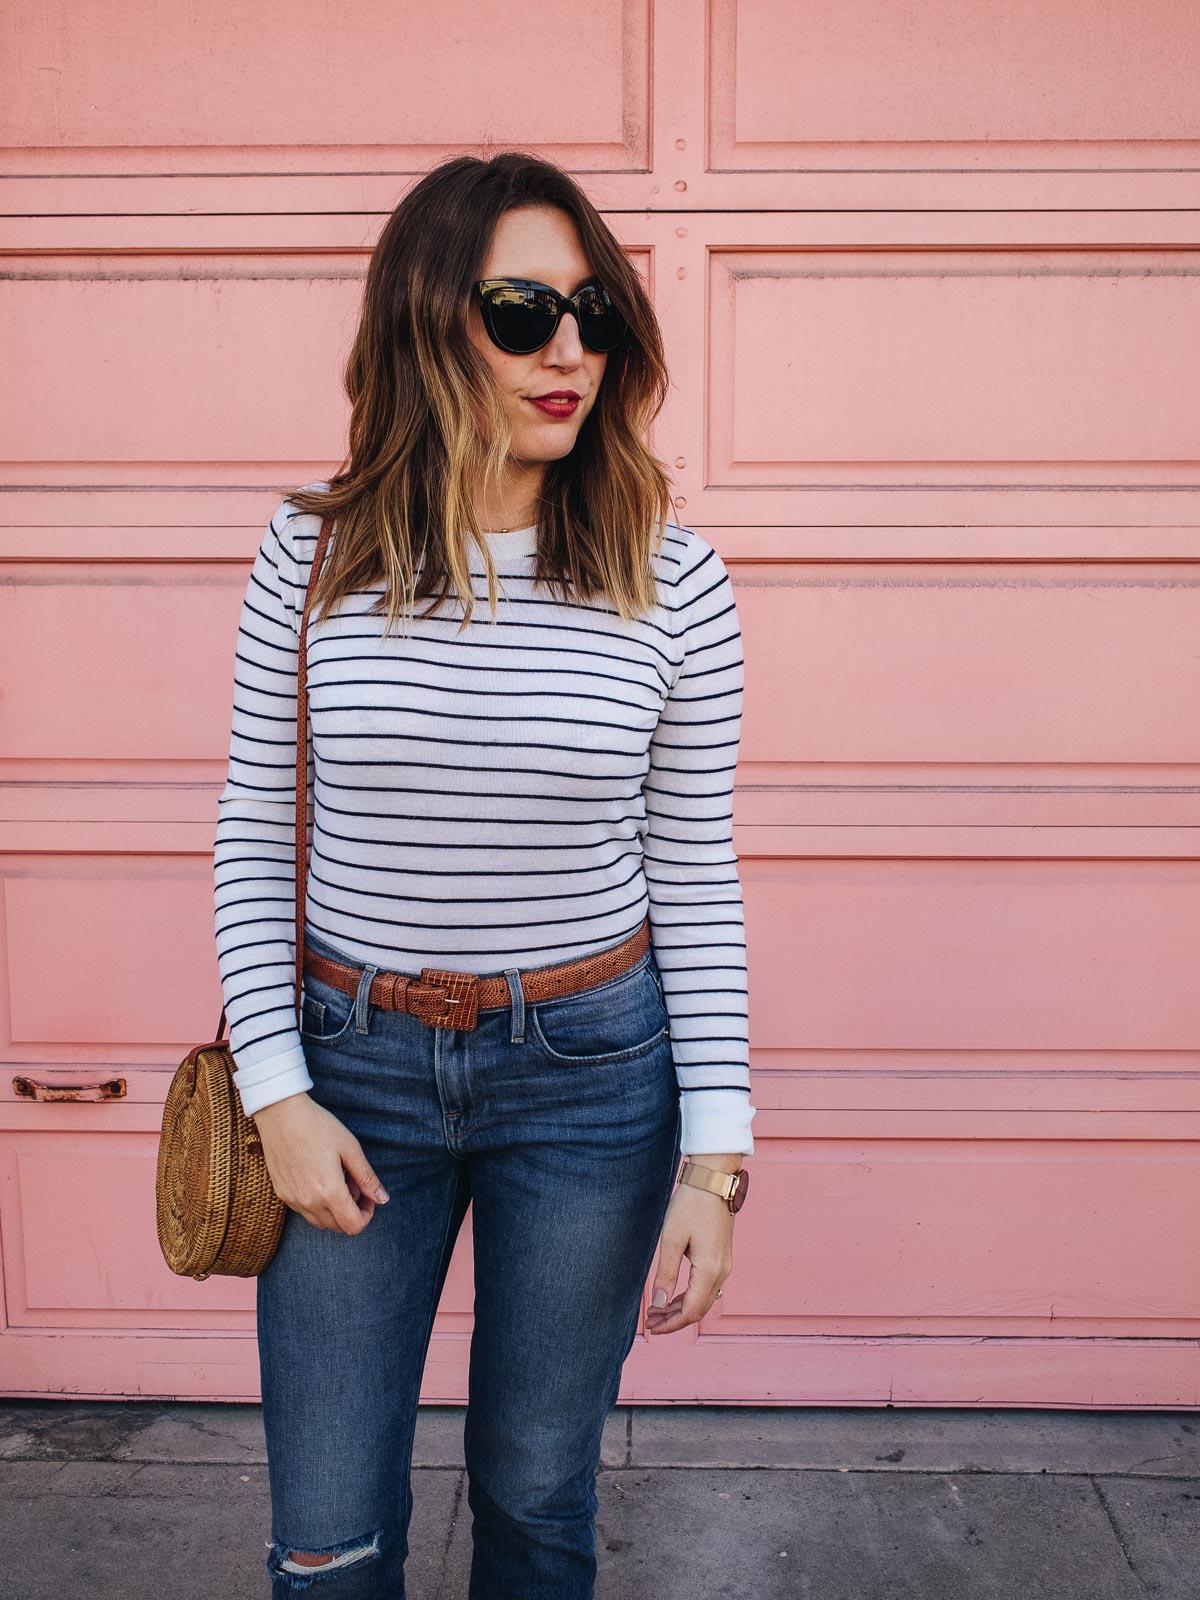 Dressing for Paris in San Francisco | Featuring a Club Monaco striped top, Frame cropped jeans, a vintage brown belt, black J Crew flats, Wood/Grey basket bag, Neubau black sunglasses | Wolf & Stag